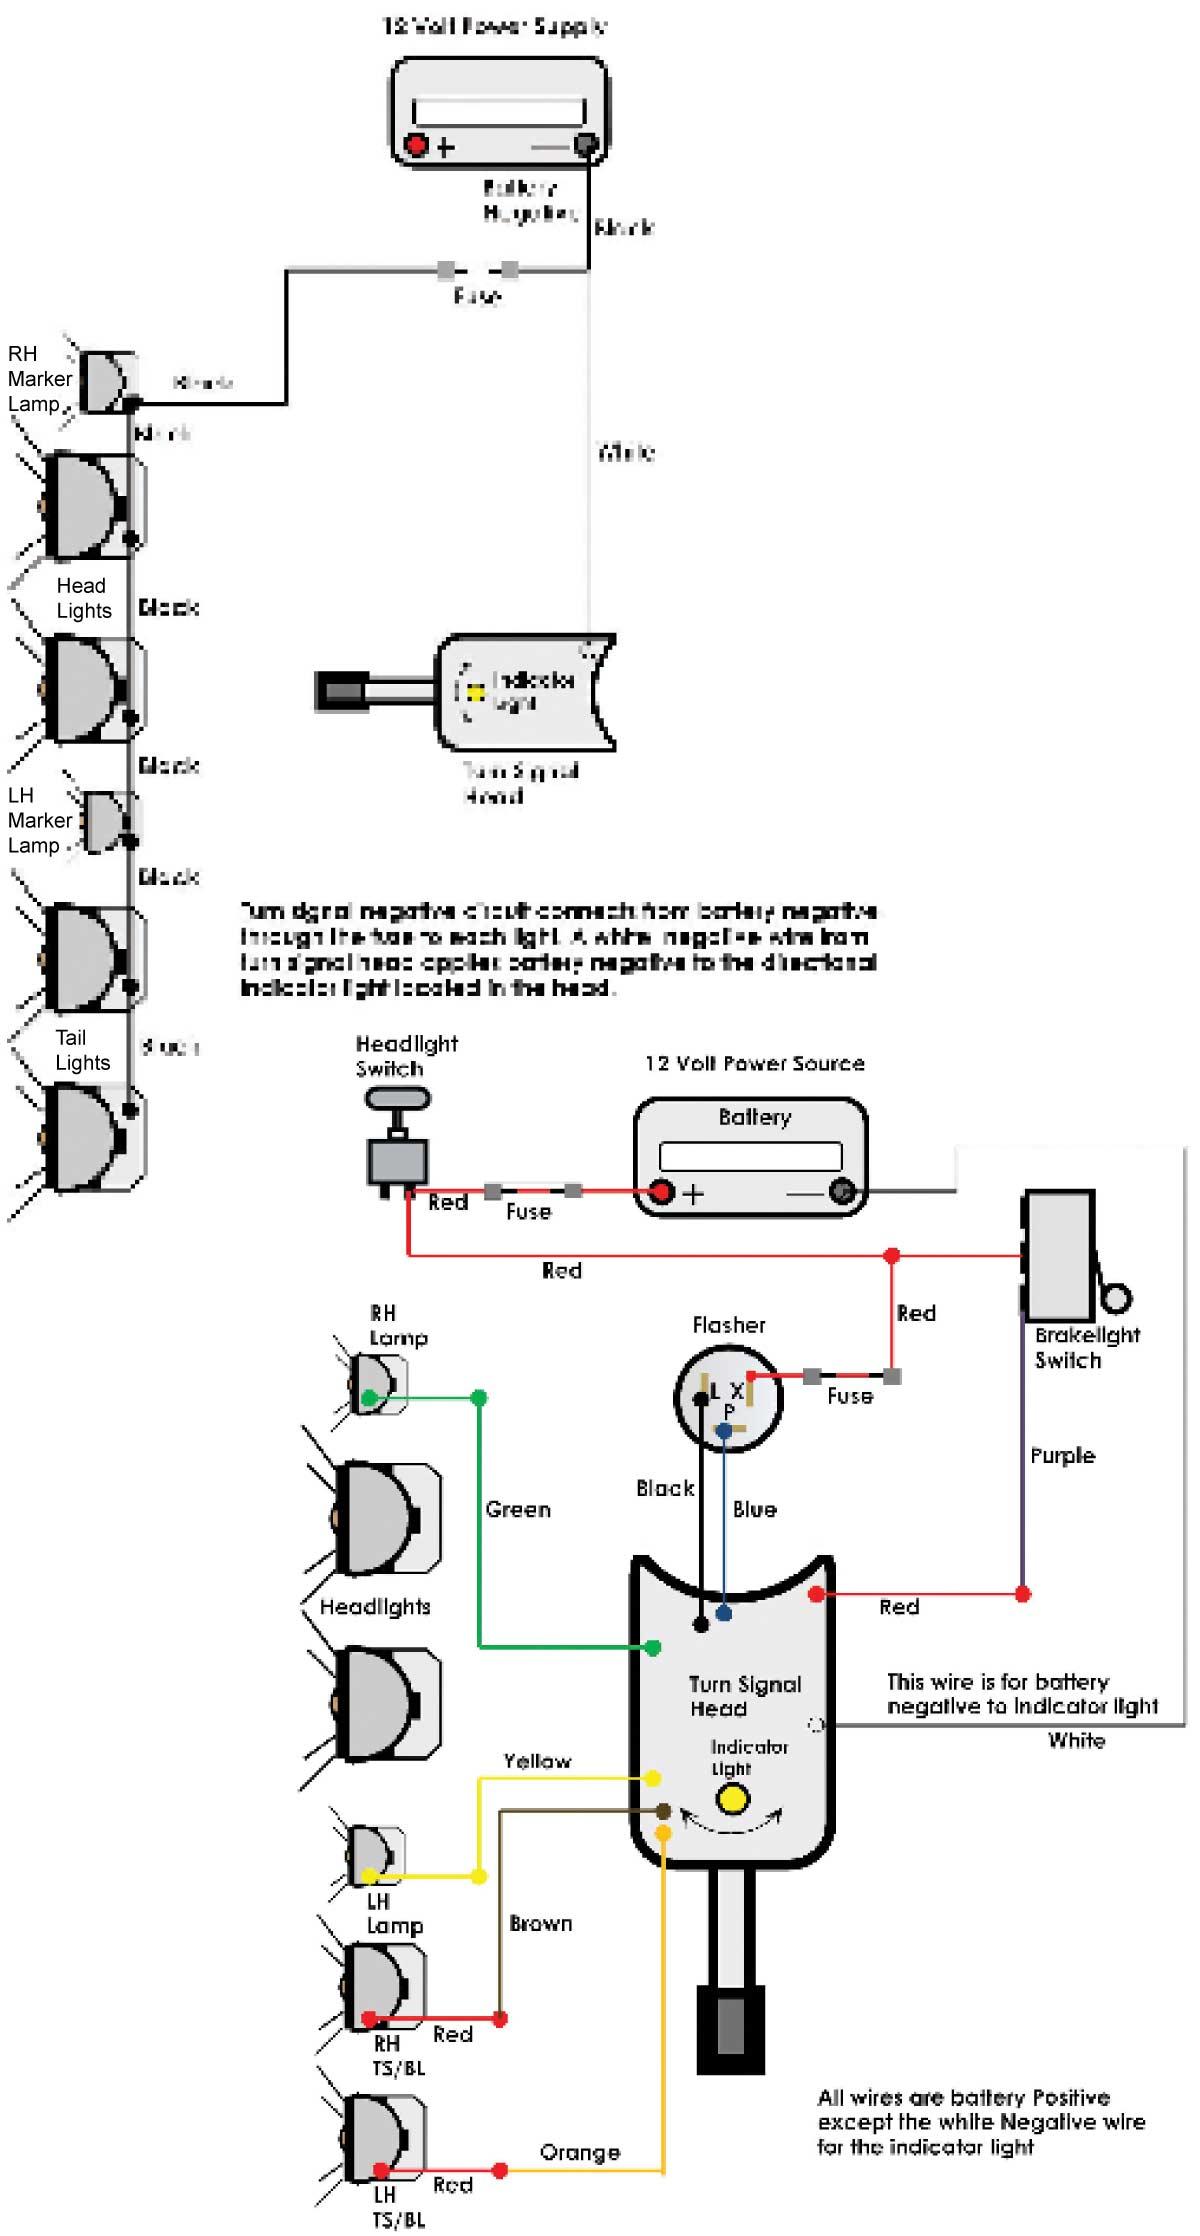 Golf Cart Wiring Diagram Neutral Safety Switch | Wiring Diagram - Brake Light Switch Wiring Diagram